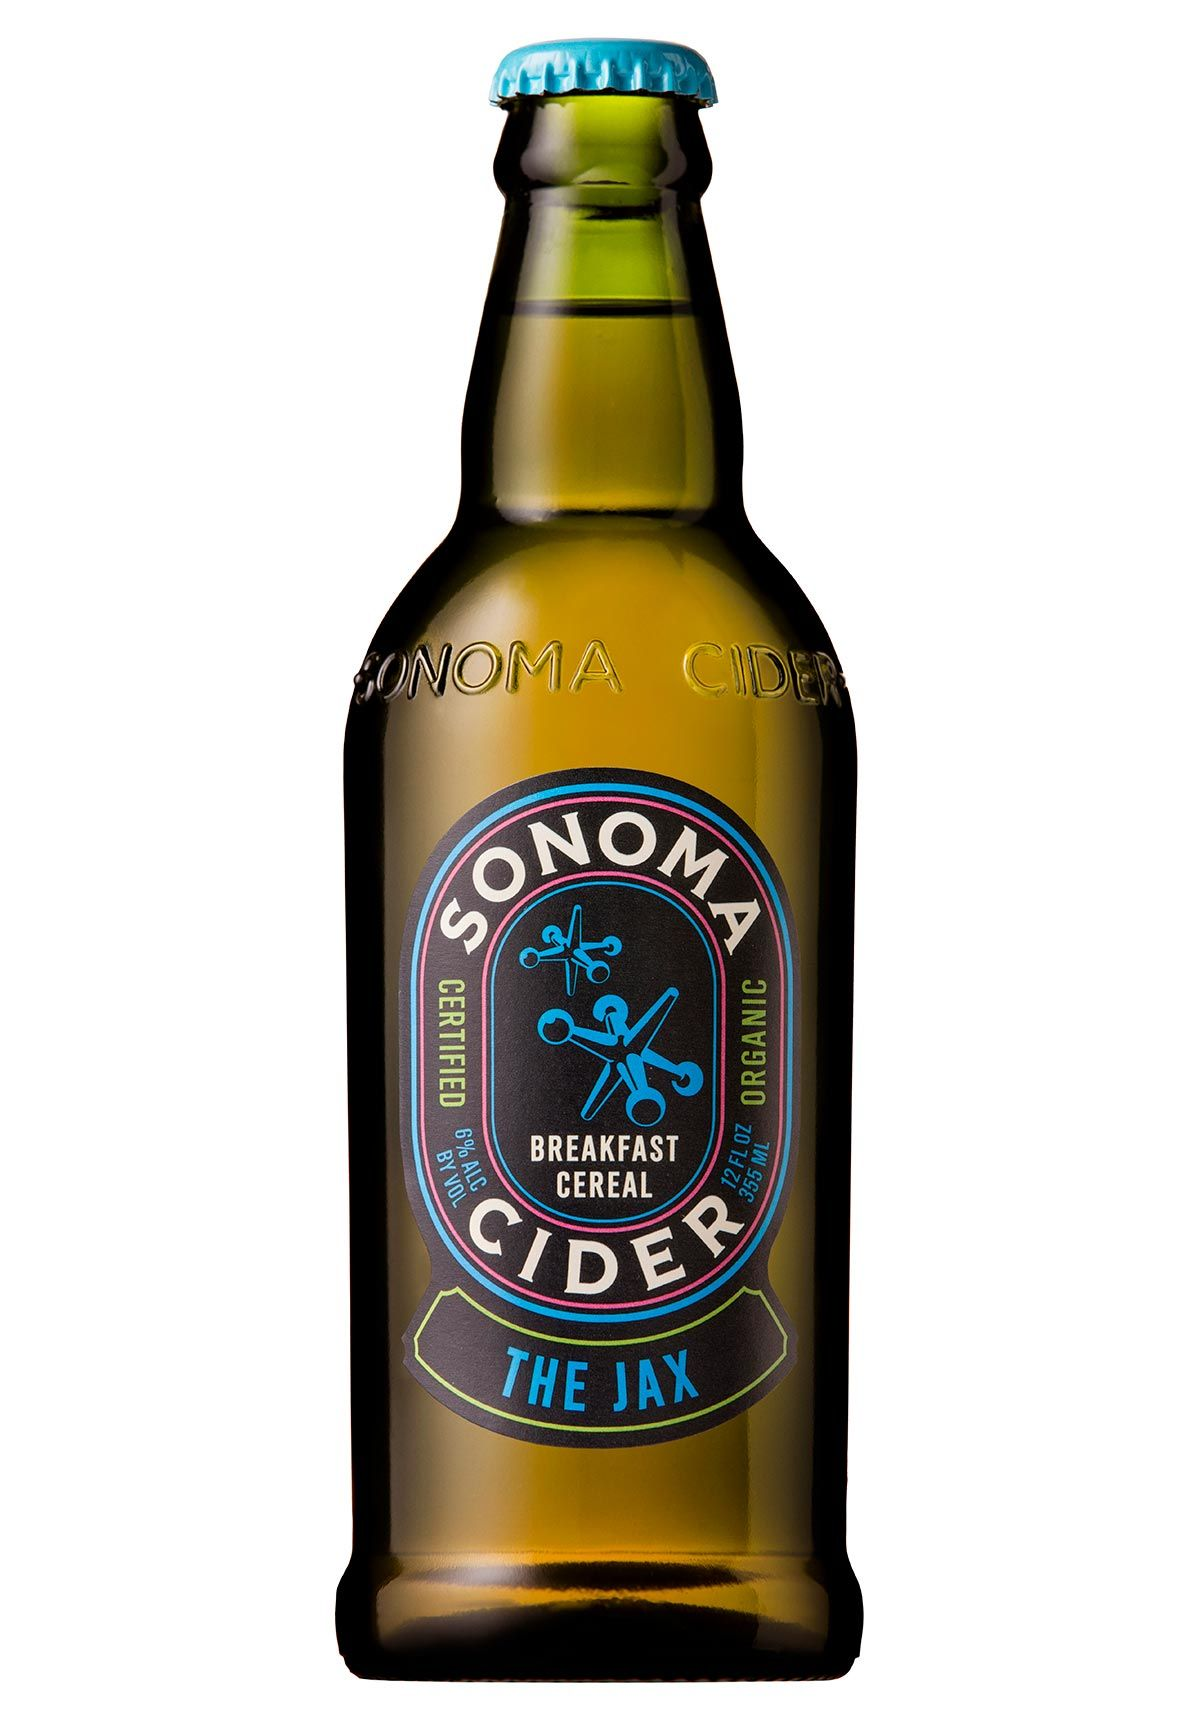 Sonoma Cider Releases The Jax Breakfast Cereal Cider